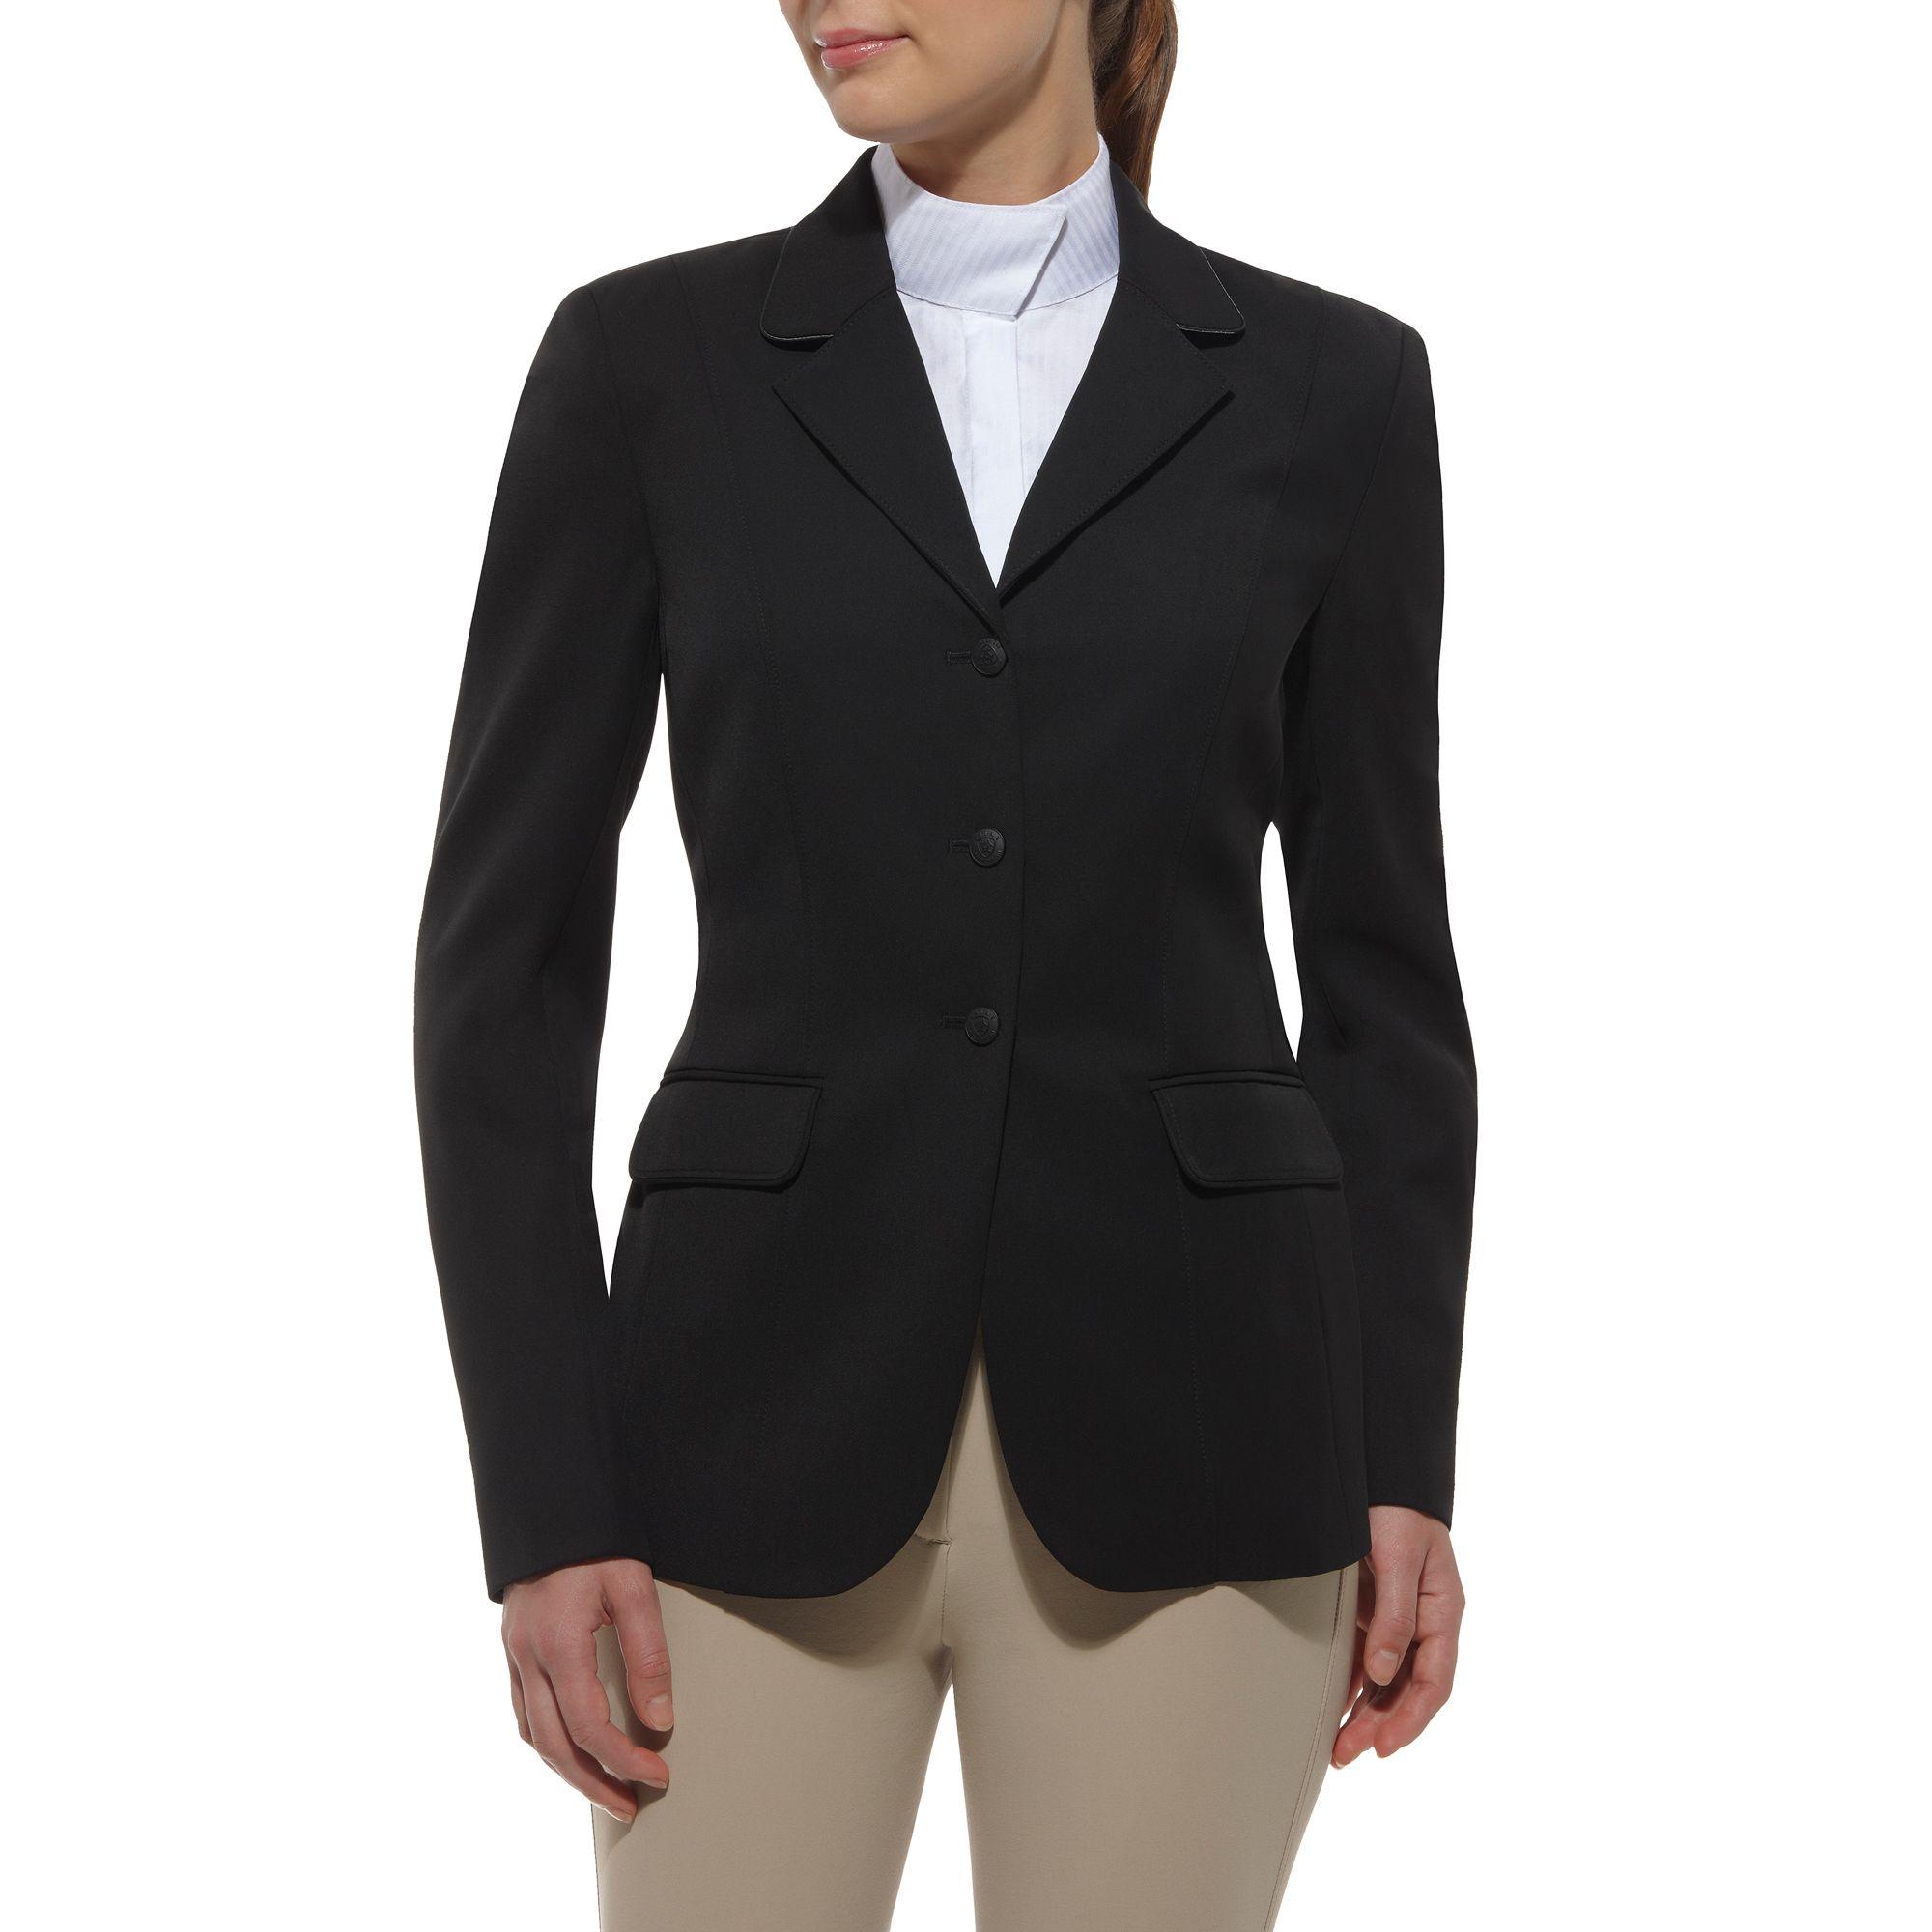 Ariat Heritage Cross Over Coat - Ladies, Black